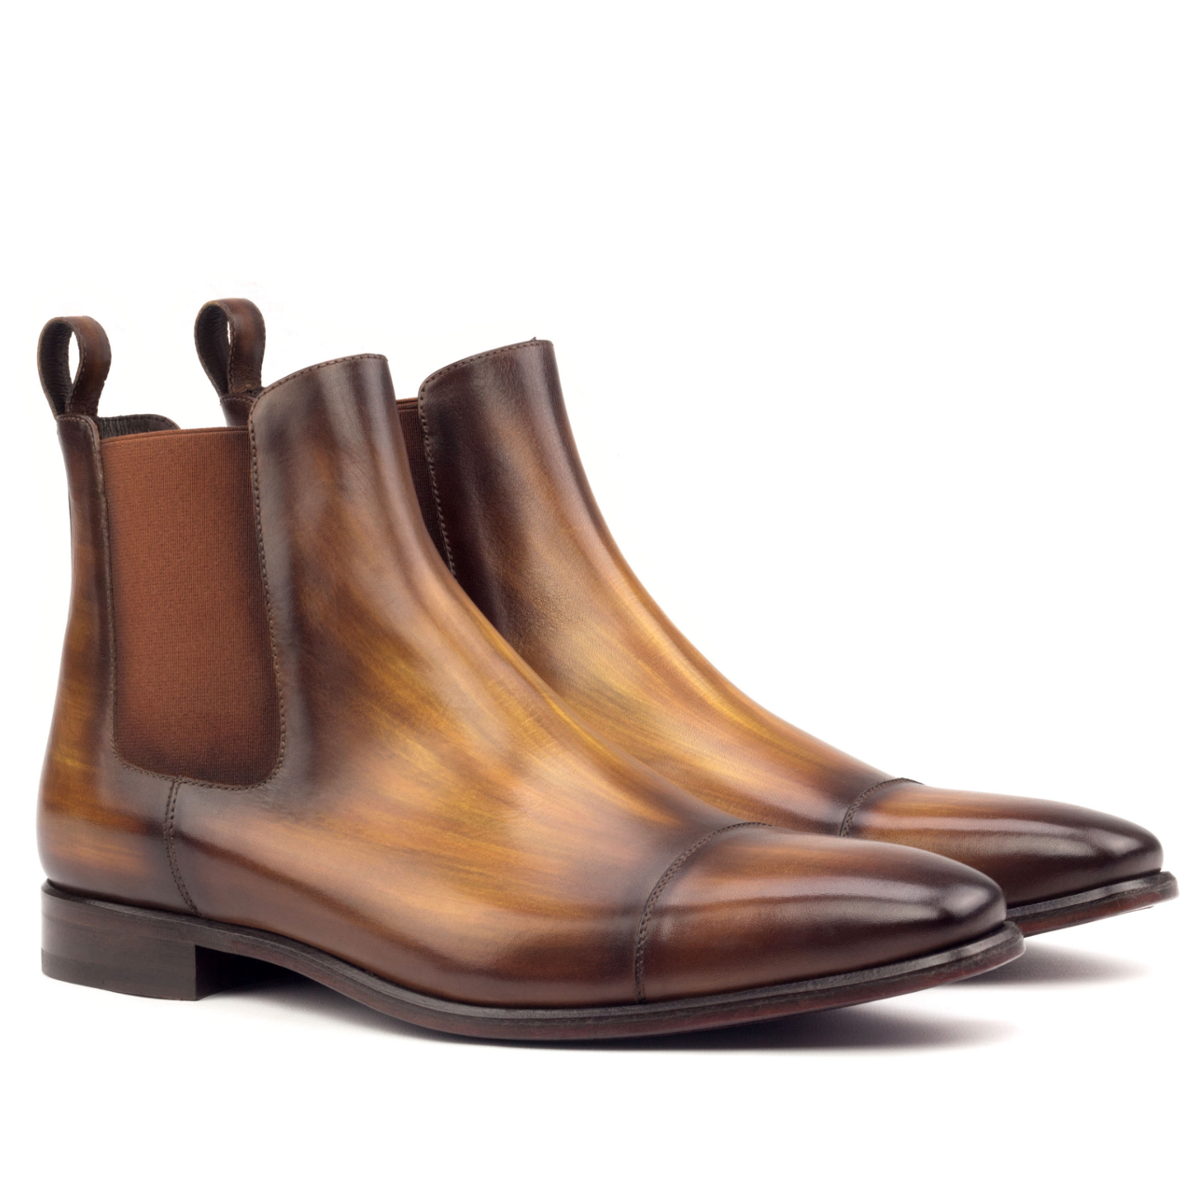 Brown crust patina Chelsea boot